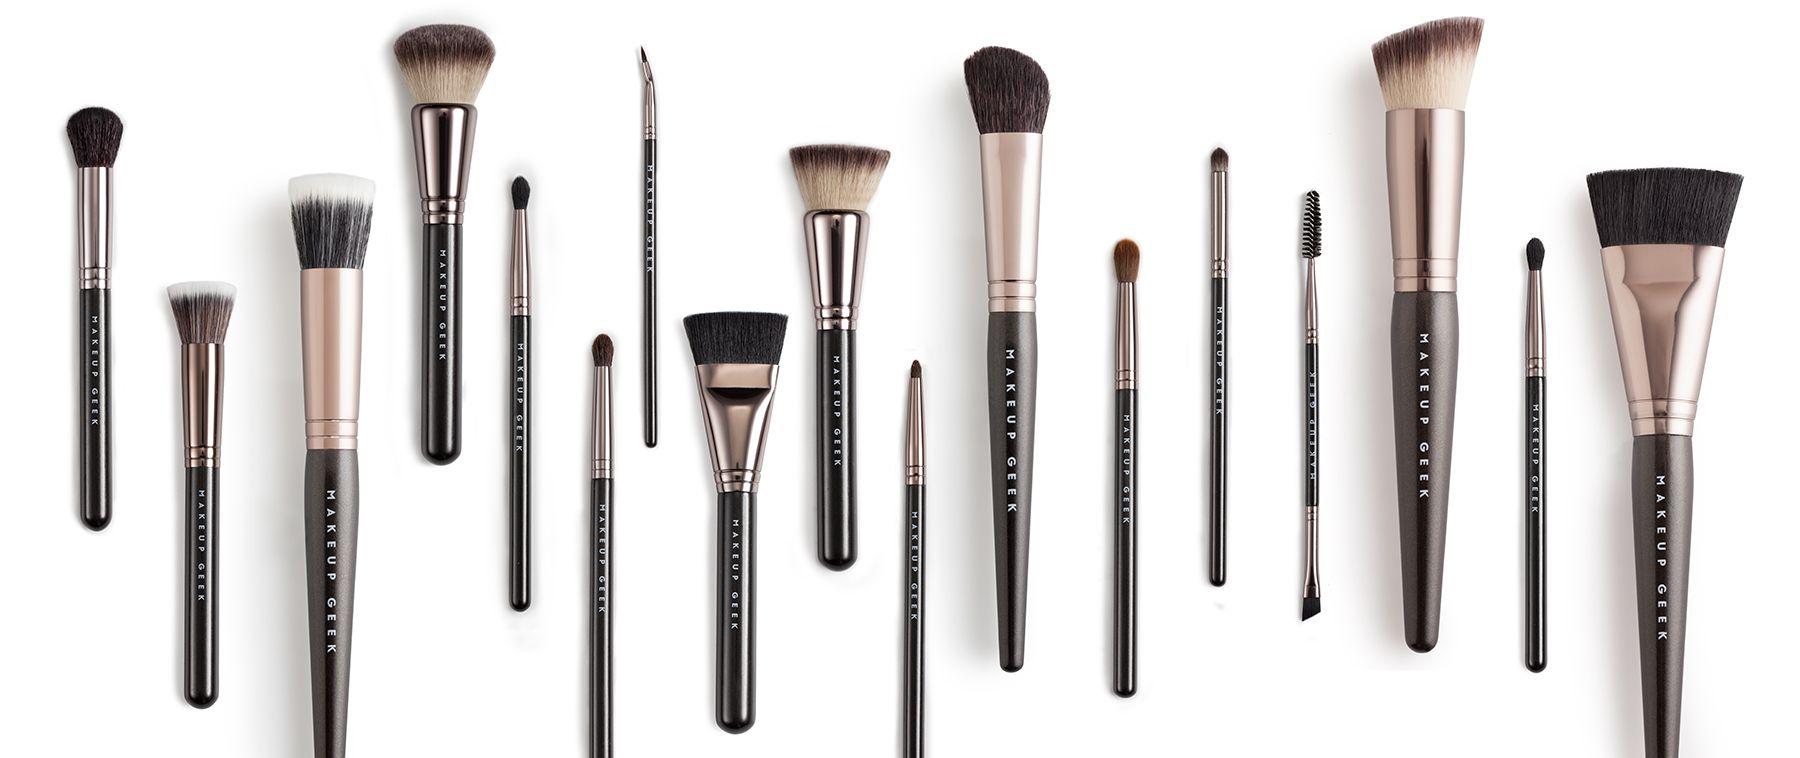 Makeup-Geek-brush-comp-b.jpg